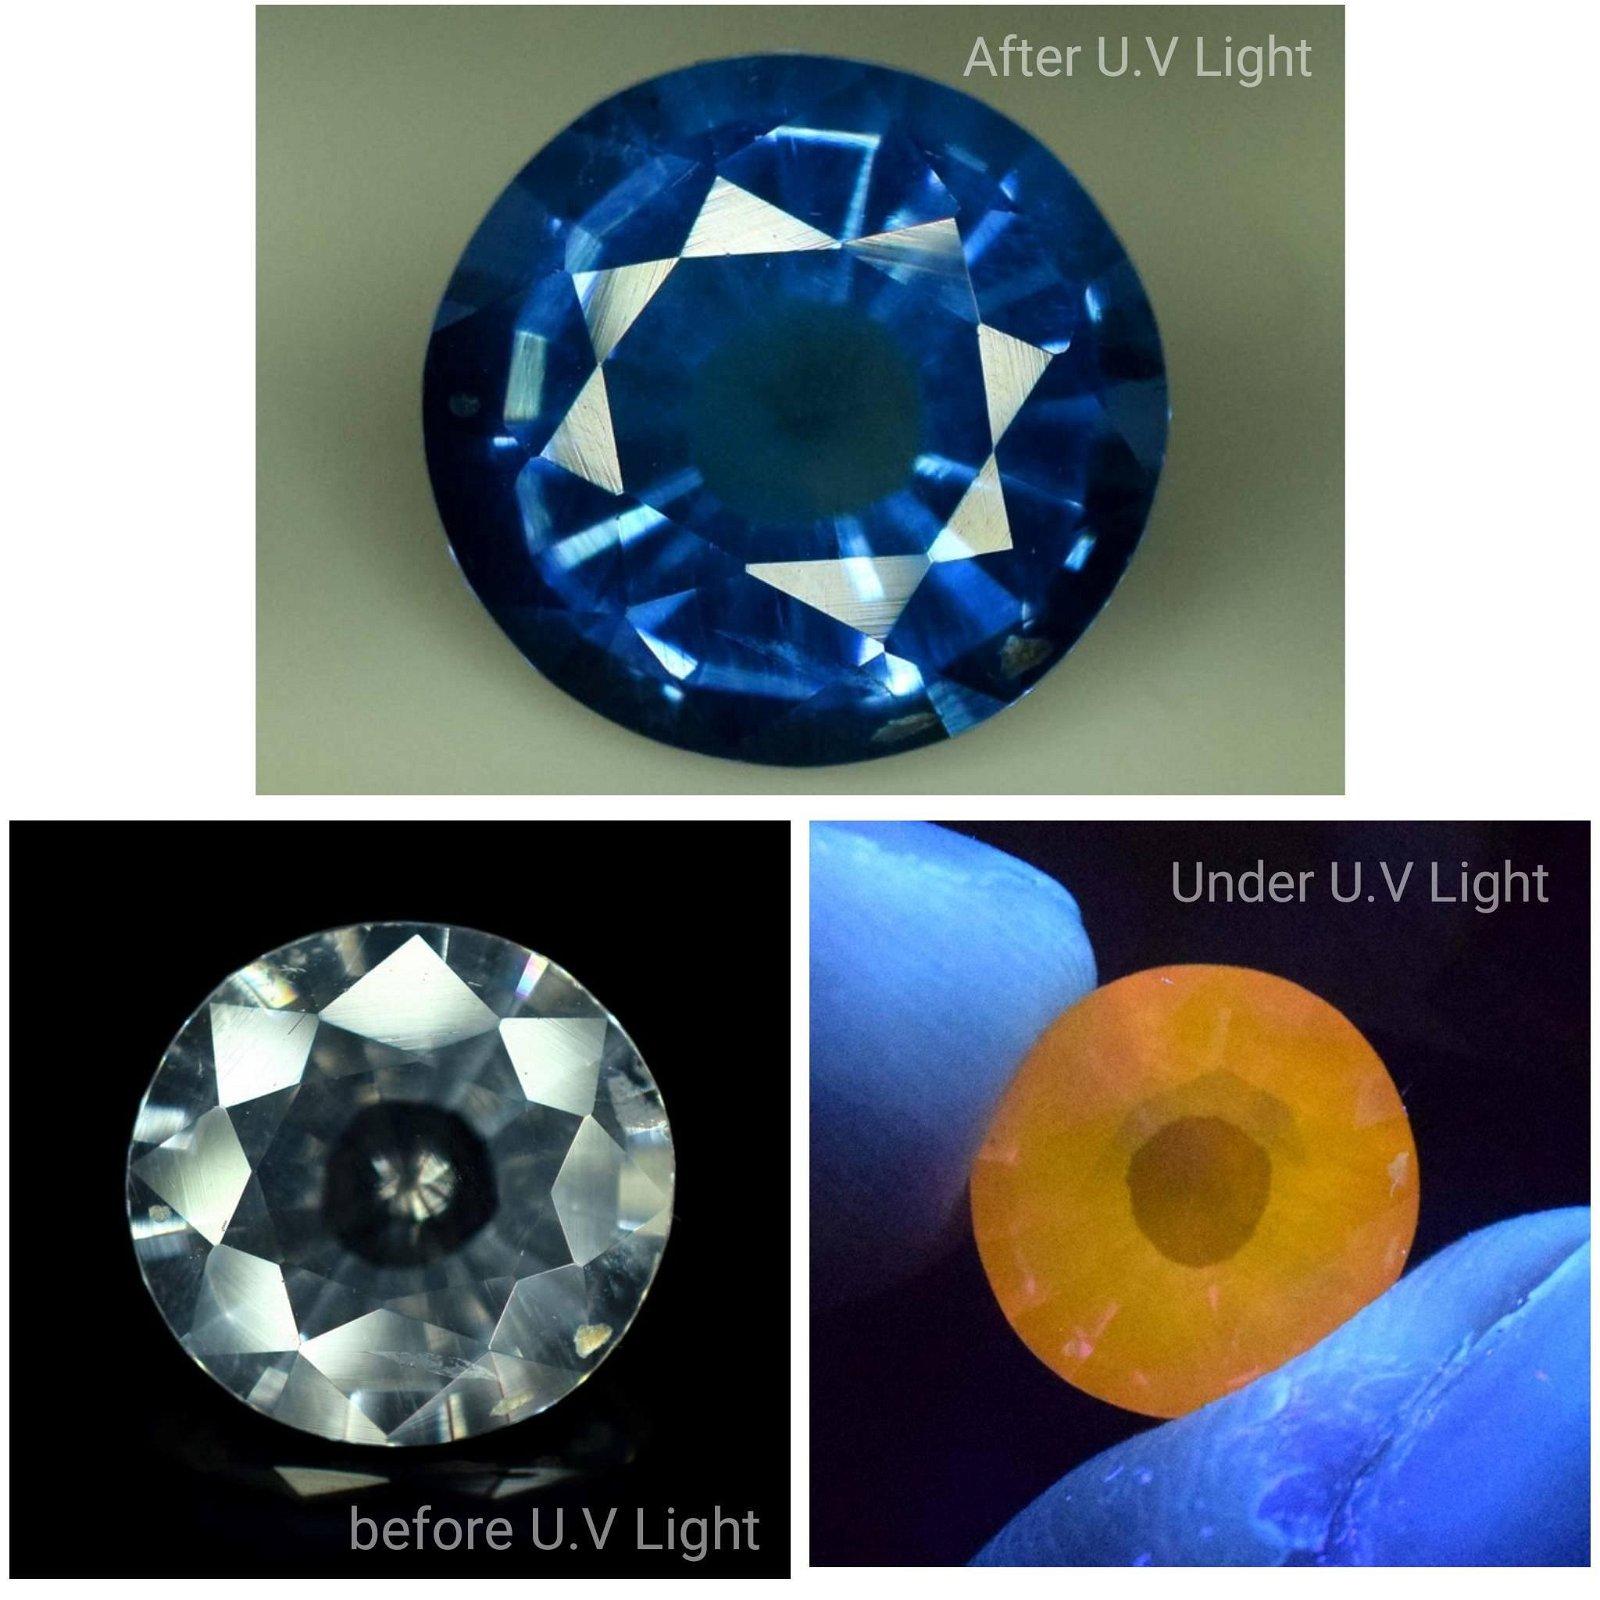 Tenebrescent Scapolite Loose Gemstone - Extremely Rare